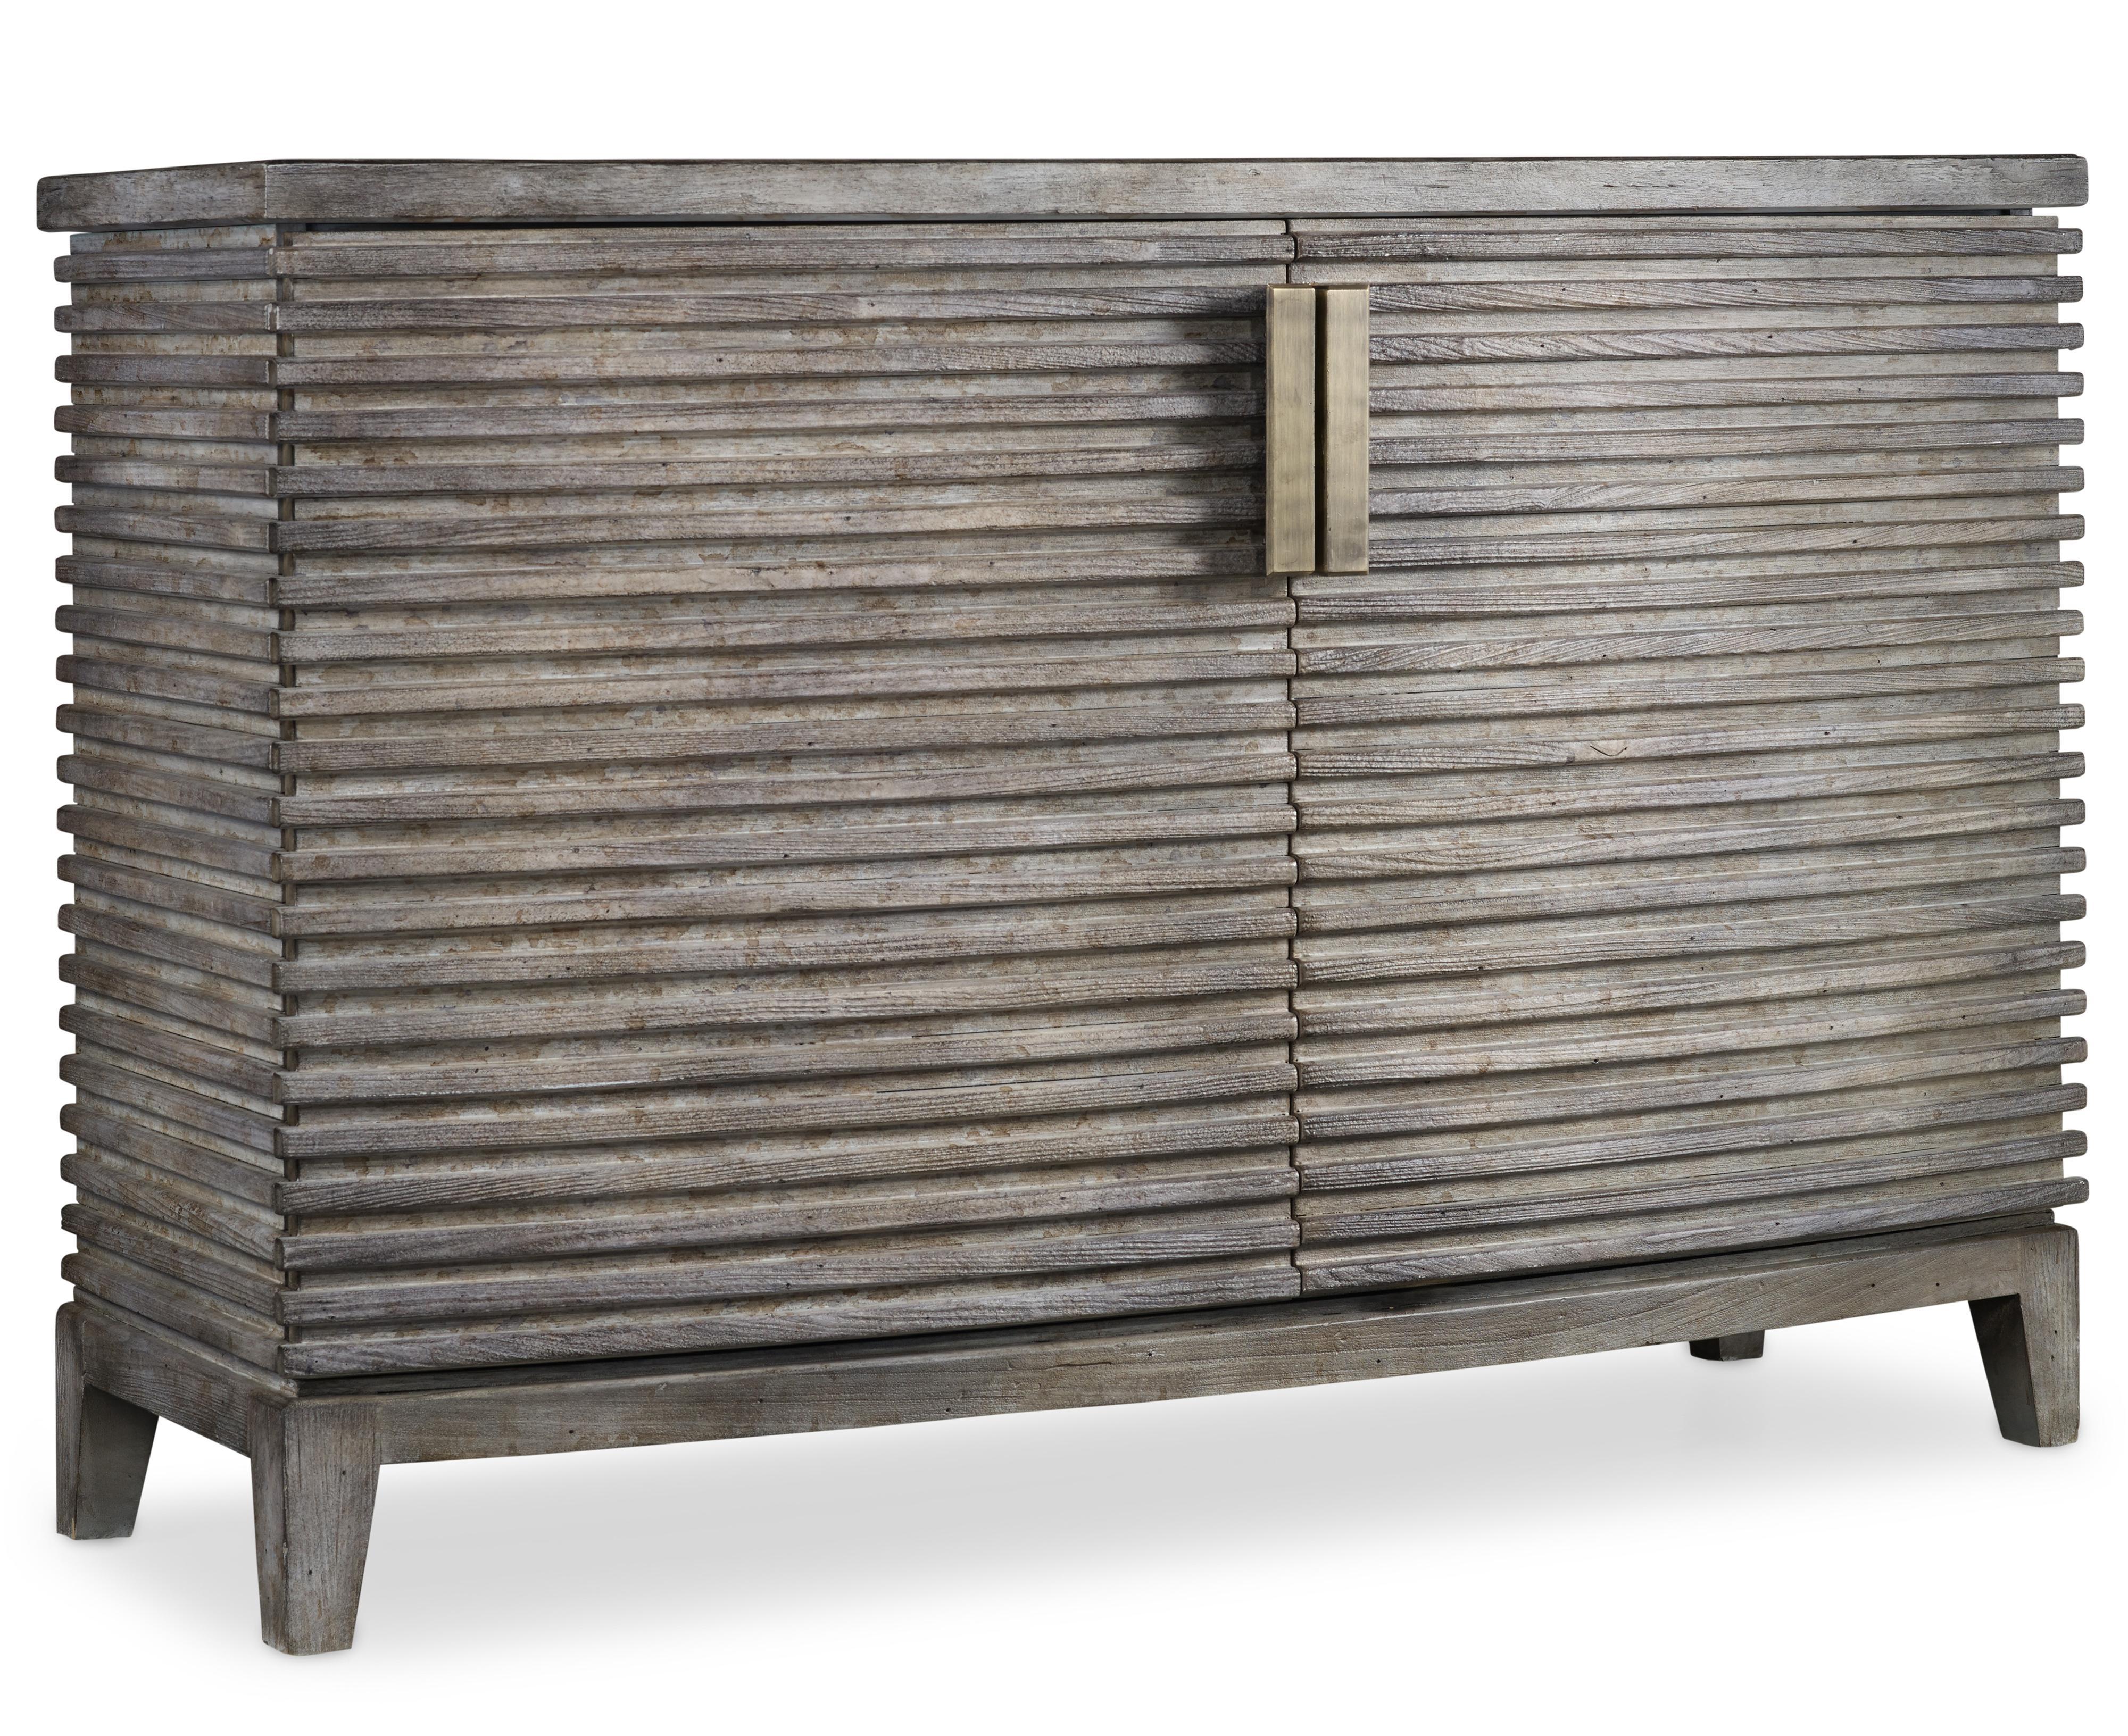 Mélange Delano Chest by Hooker Furniture at Stoney Creek Furniture